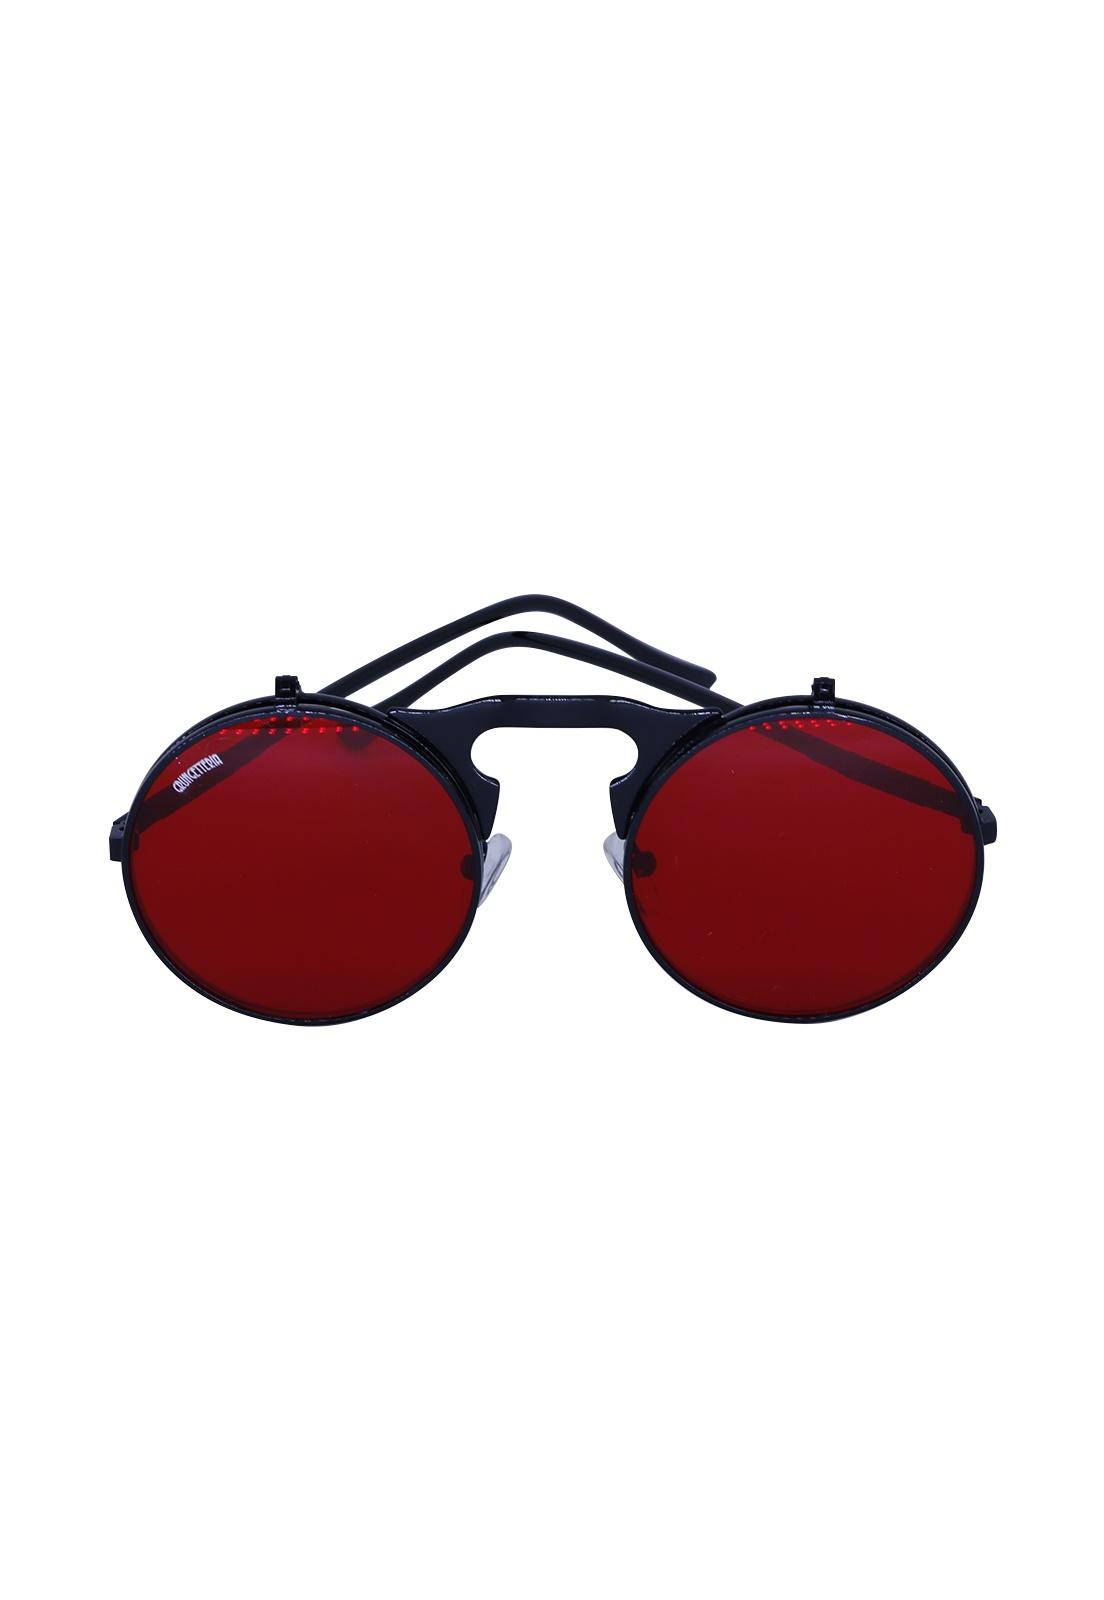 Óculos de Sol Grungetteria Narciso Vermelho